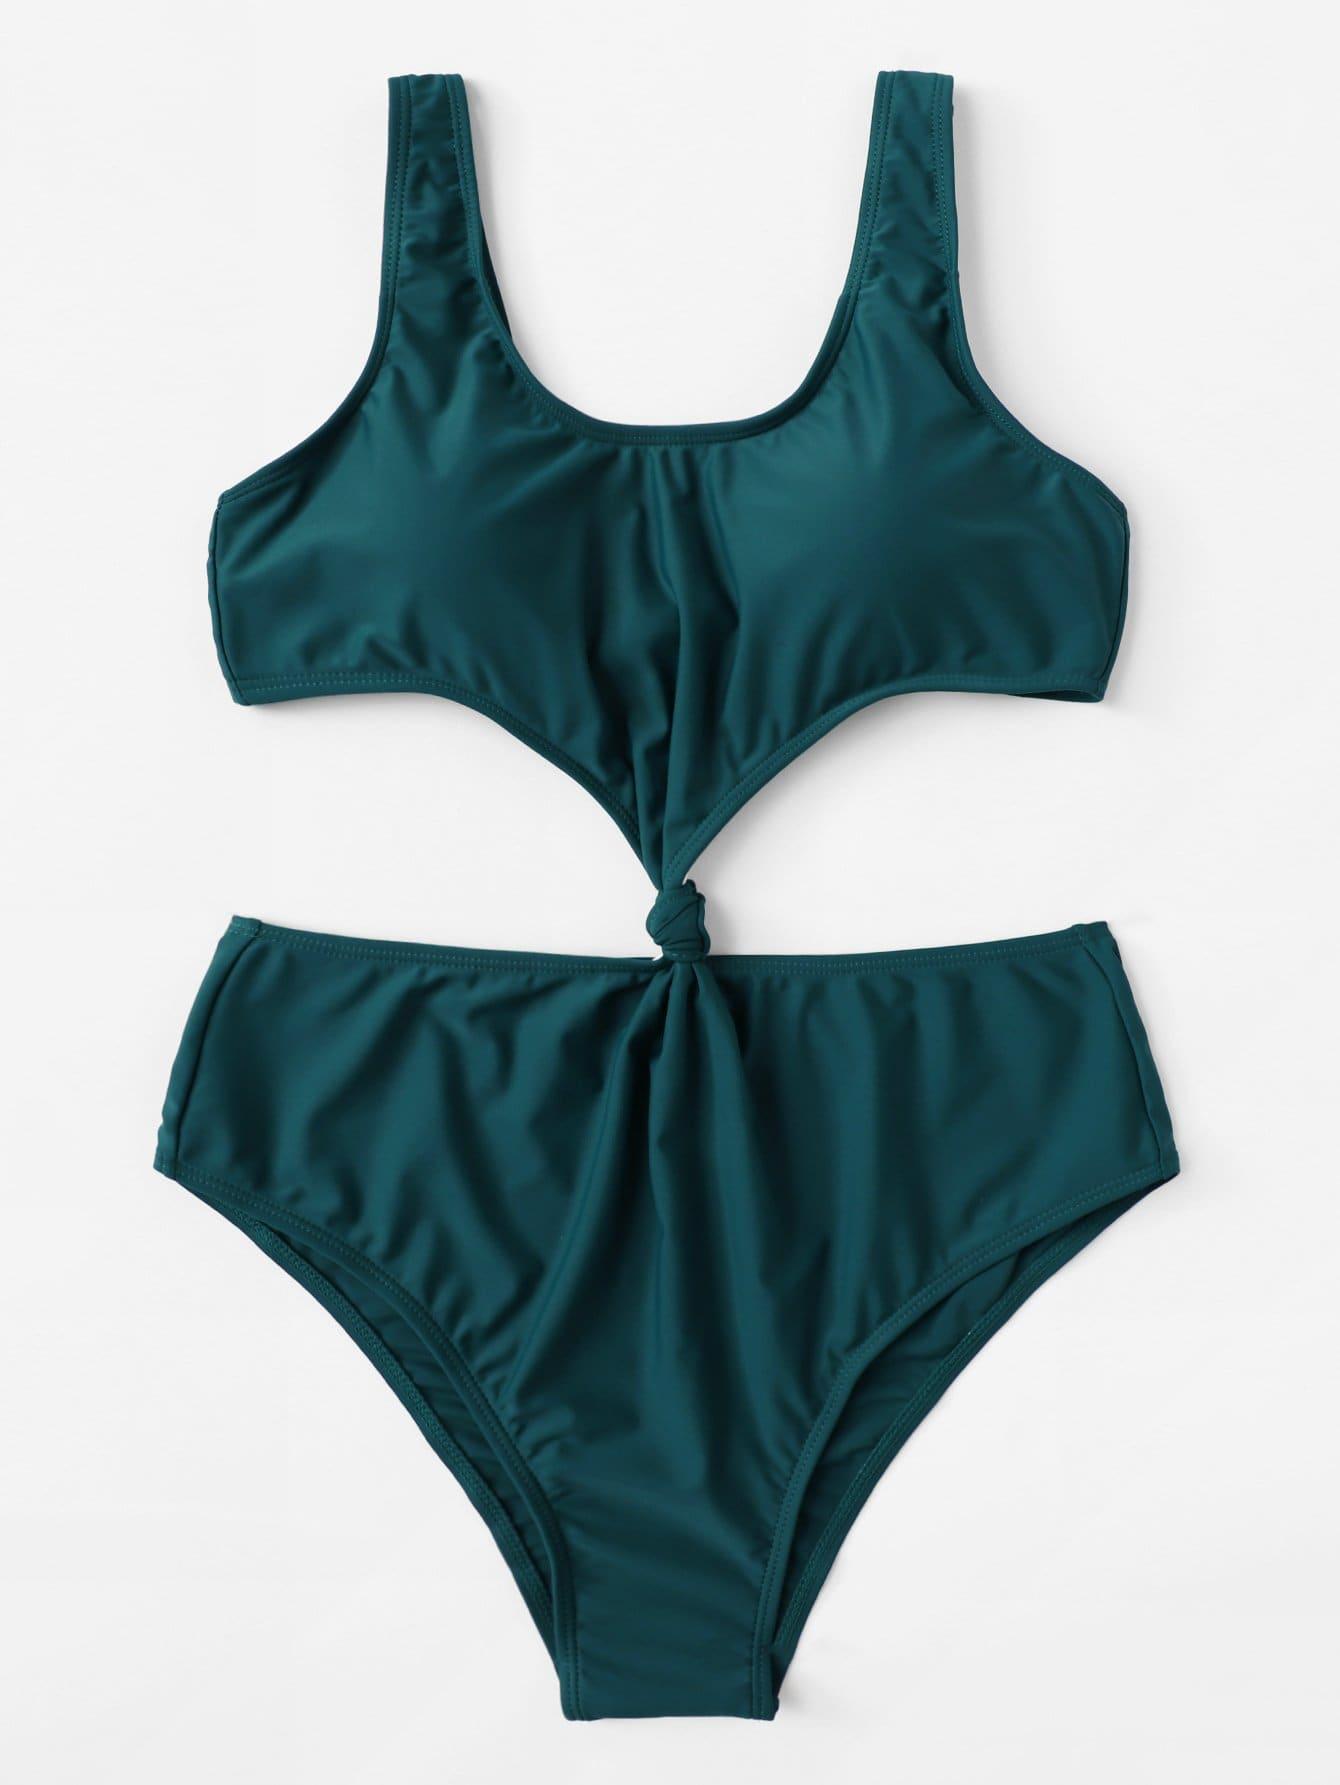 Knot Cut-Out Swimsuit knot cutout high cut swimsuit